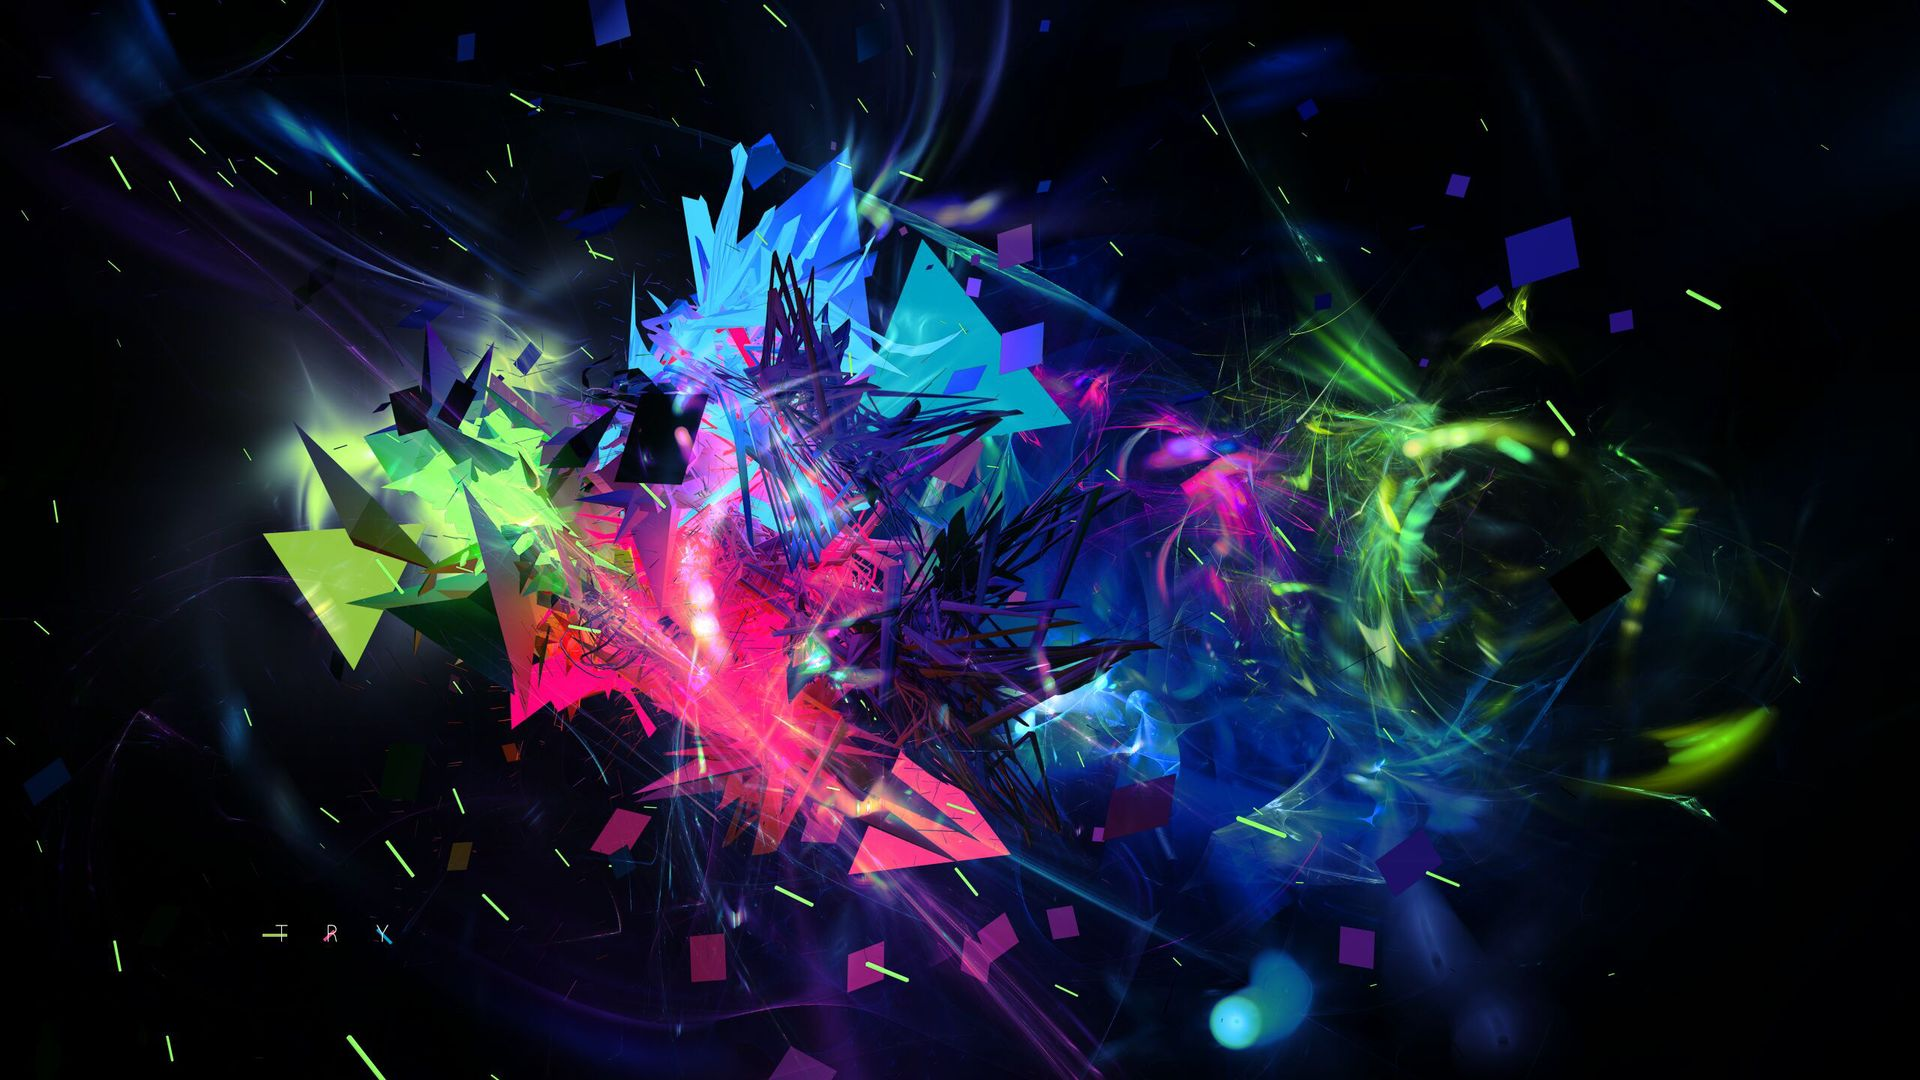 HD Wallpapers - Color Shards - Wattpad